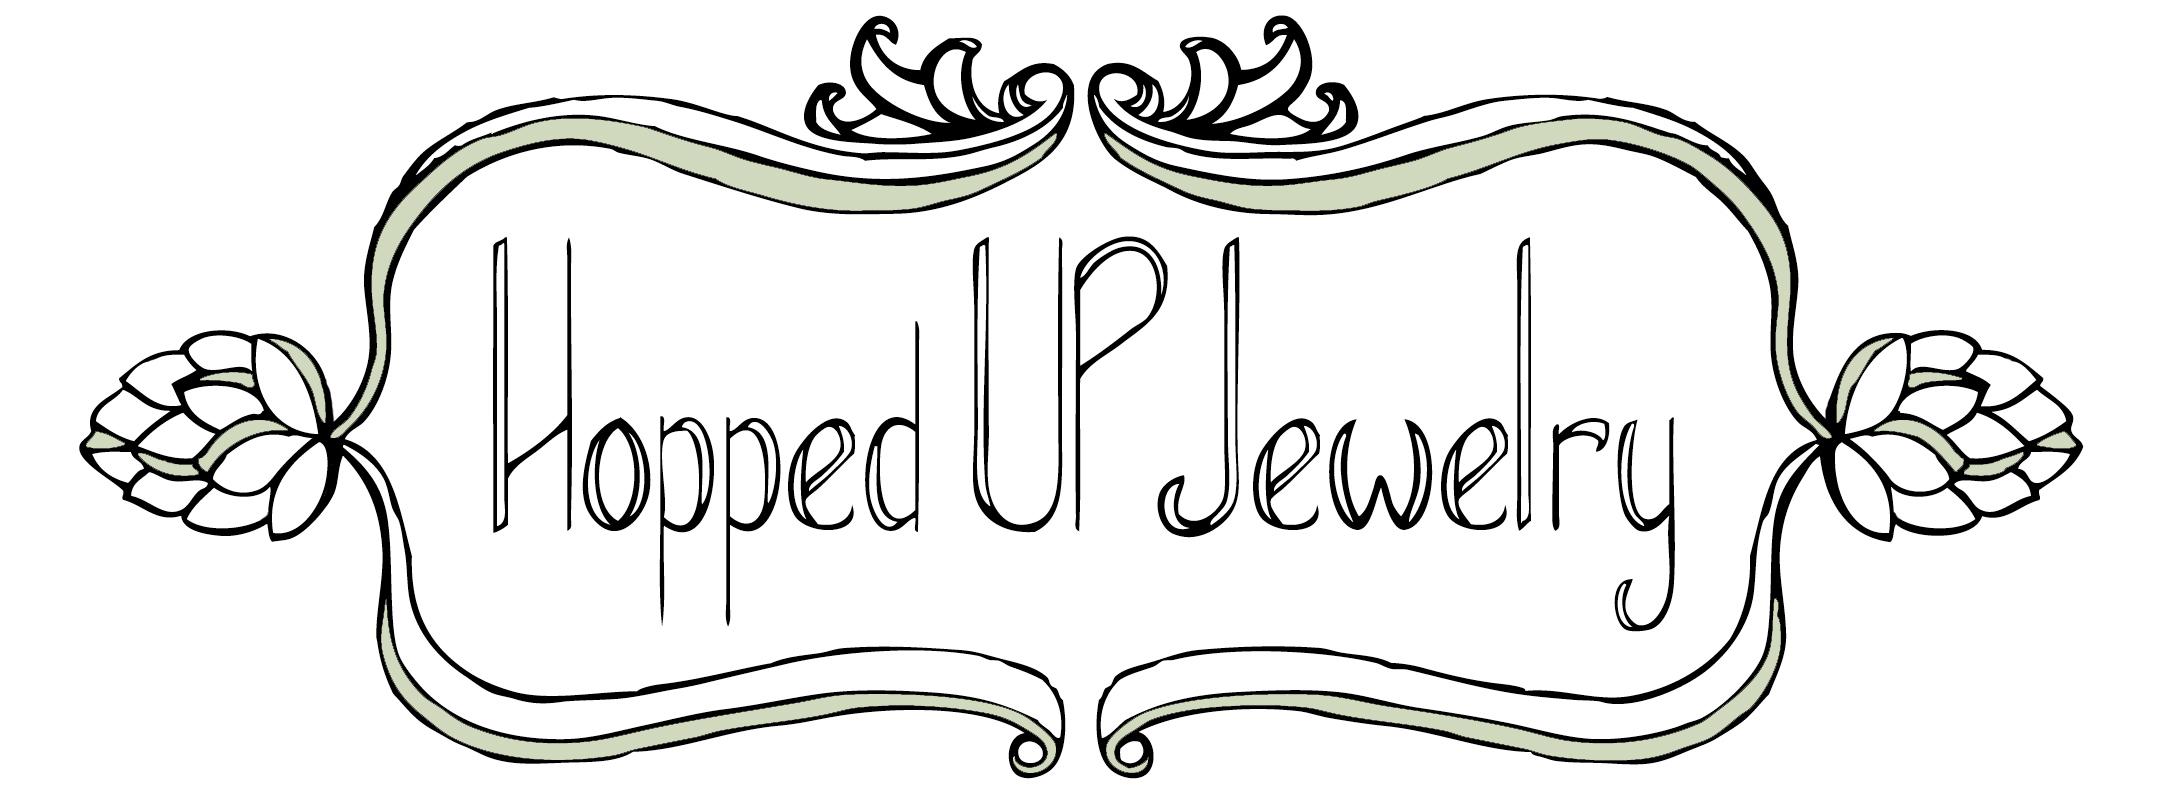 Hopped Up Jewelry Logo